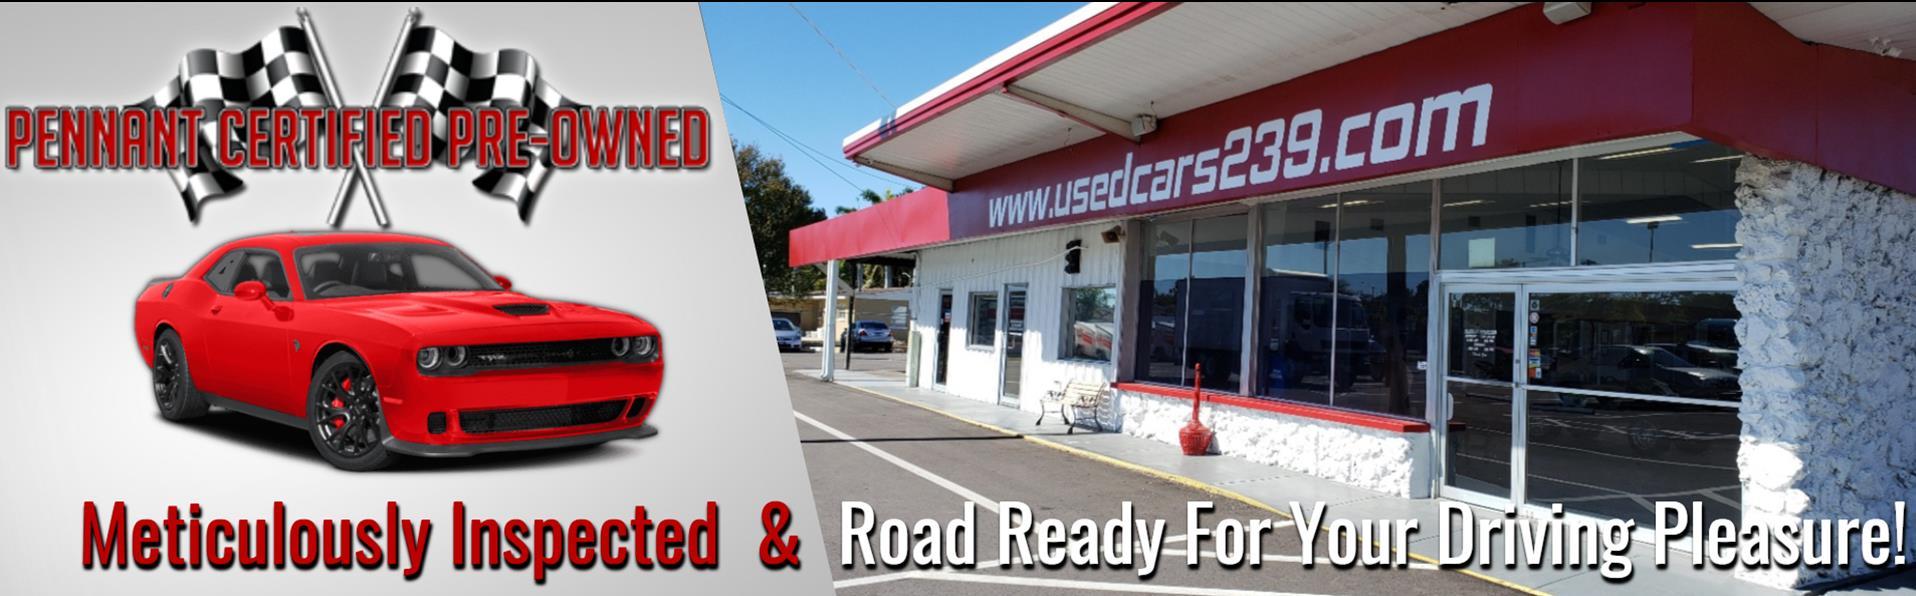 Used Cars Fort Myers >> Used Cars Fort Myers Fl Used Cars Trucks Fl Pennant